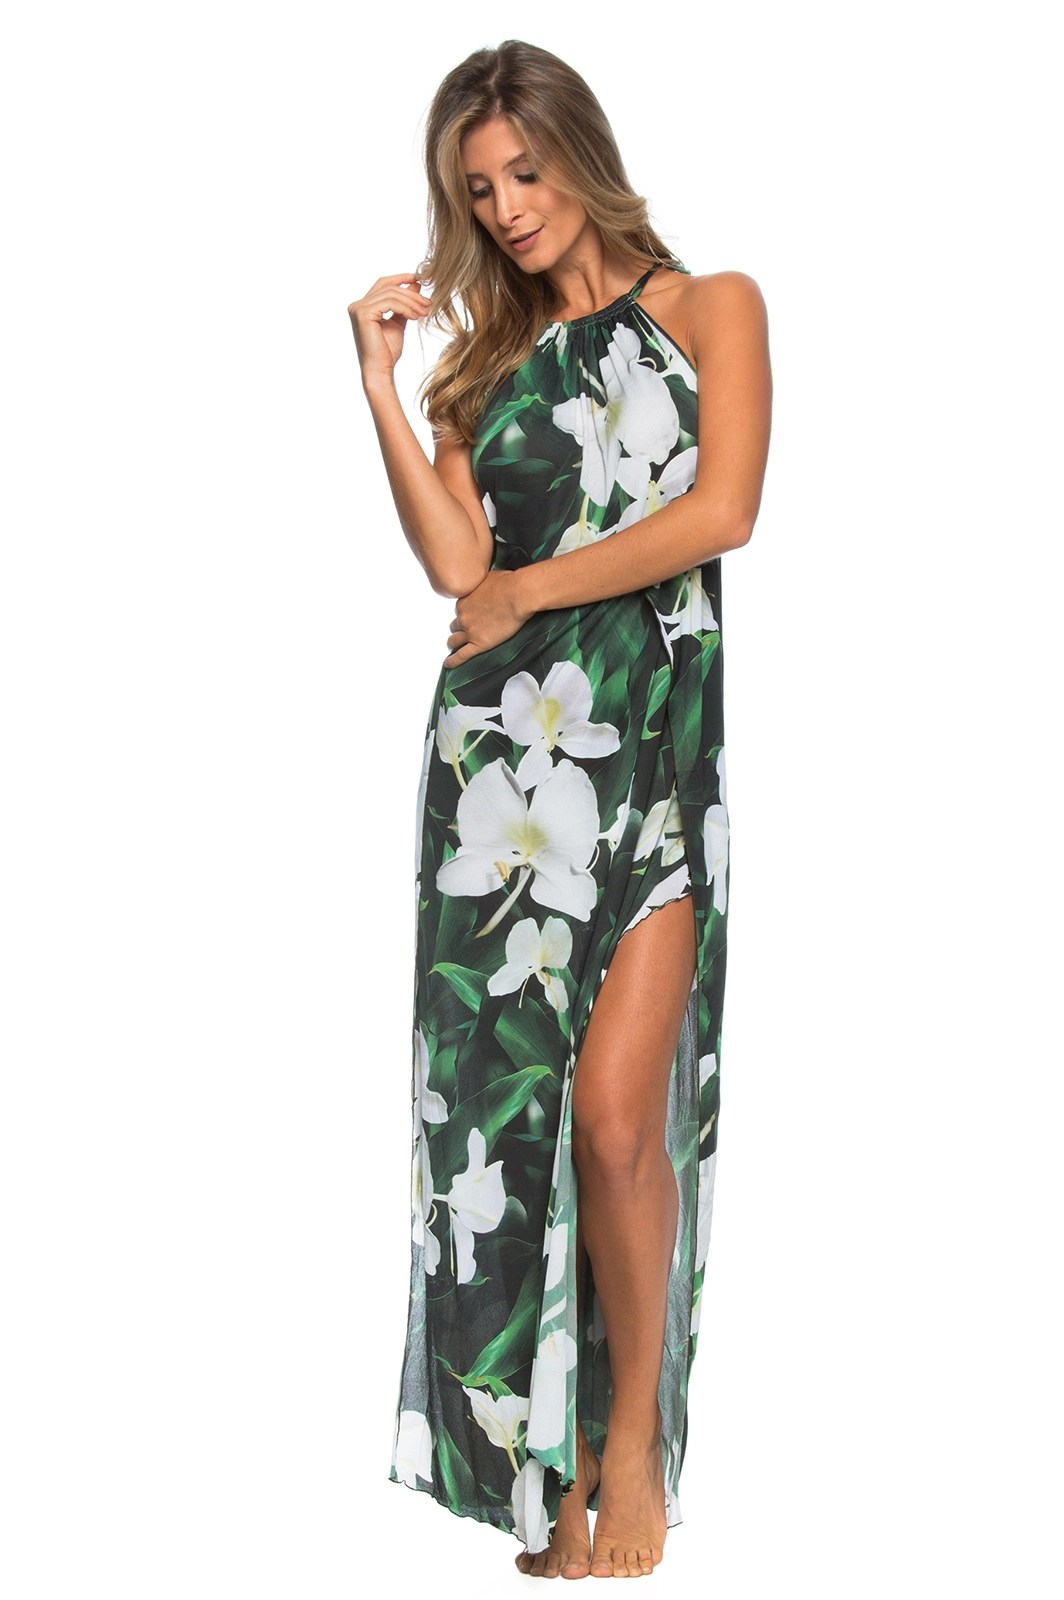 Beach Dress Long Green Beach Dress With White Flowers